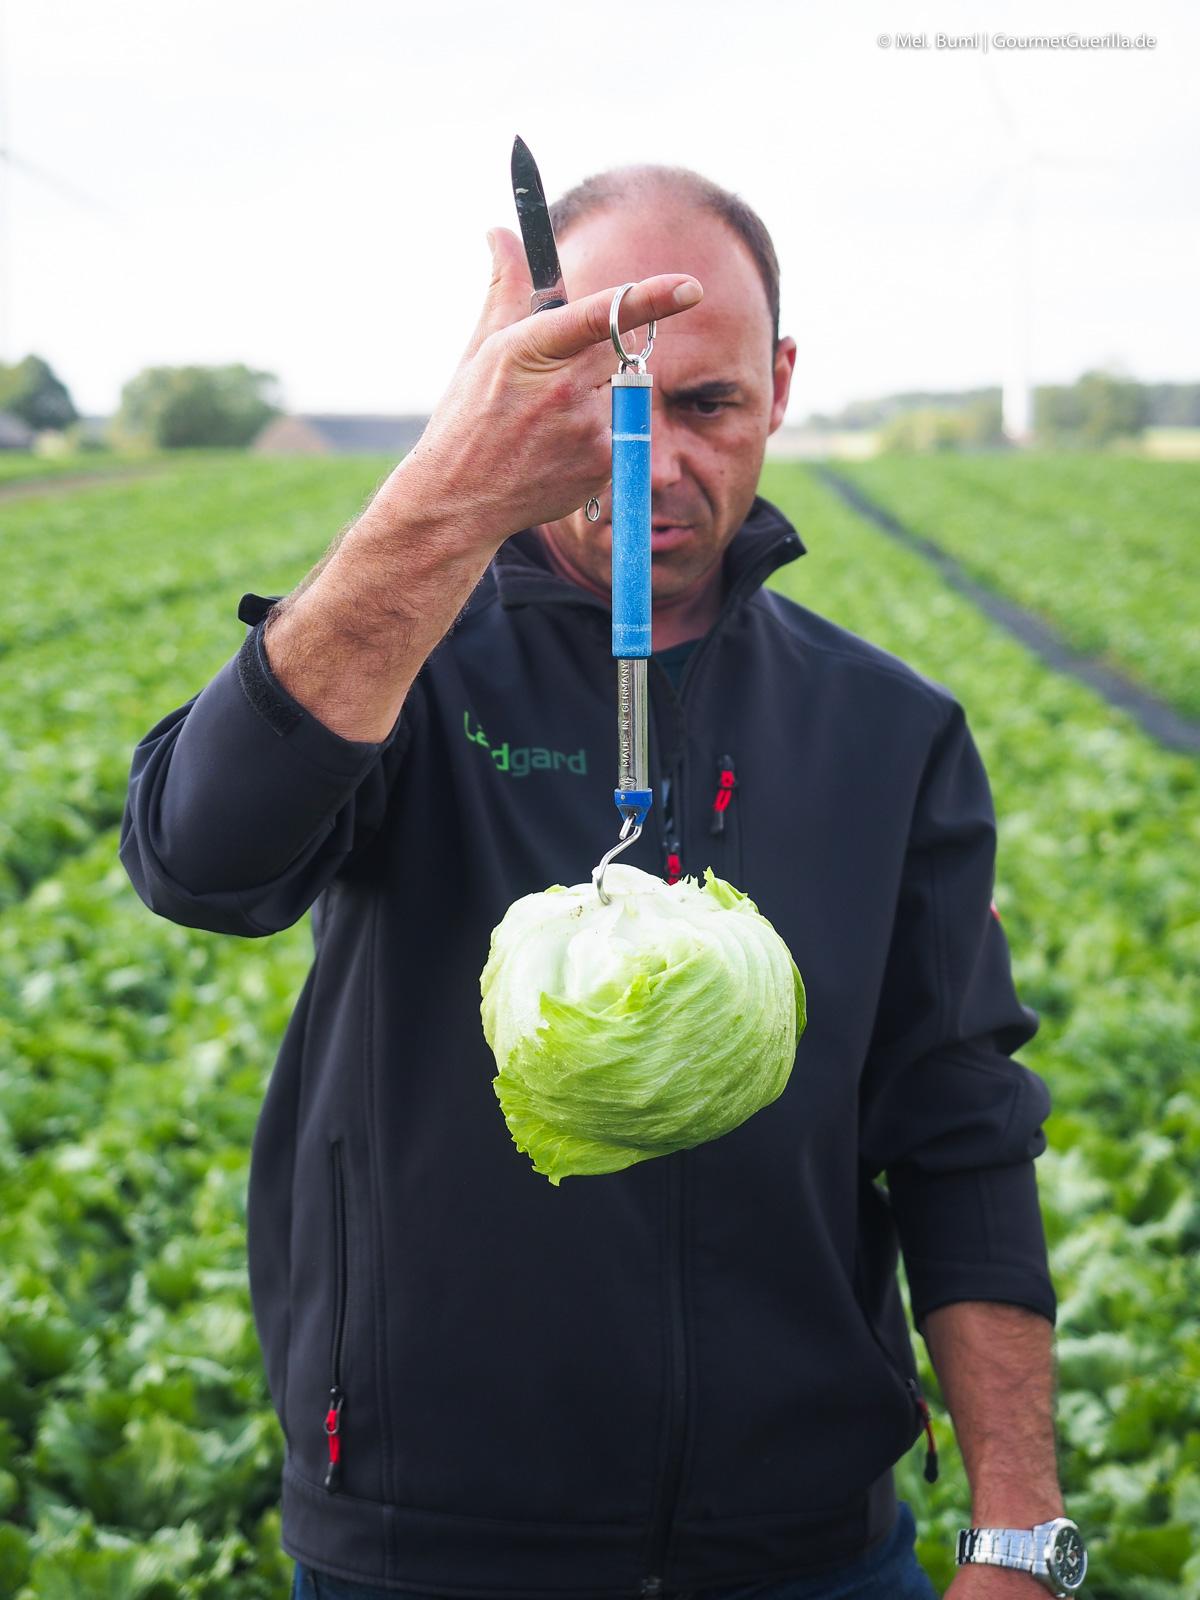 Salatwaage Eisbergsalat auf dem Feld Bonduelle Academy Salat Anbau und Verarbeitung |GourmetGuerilla.de